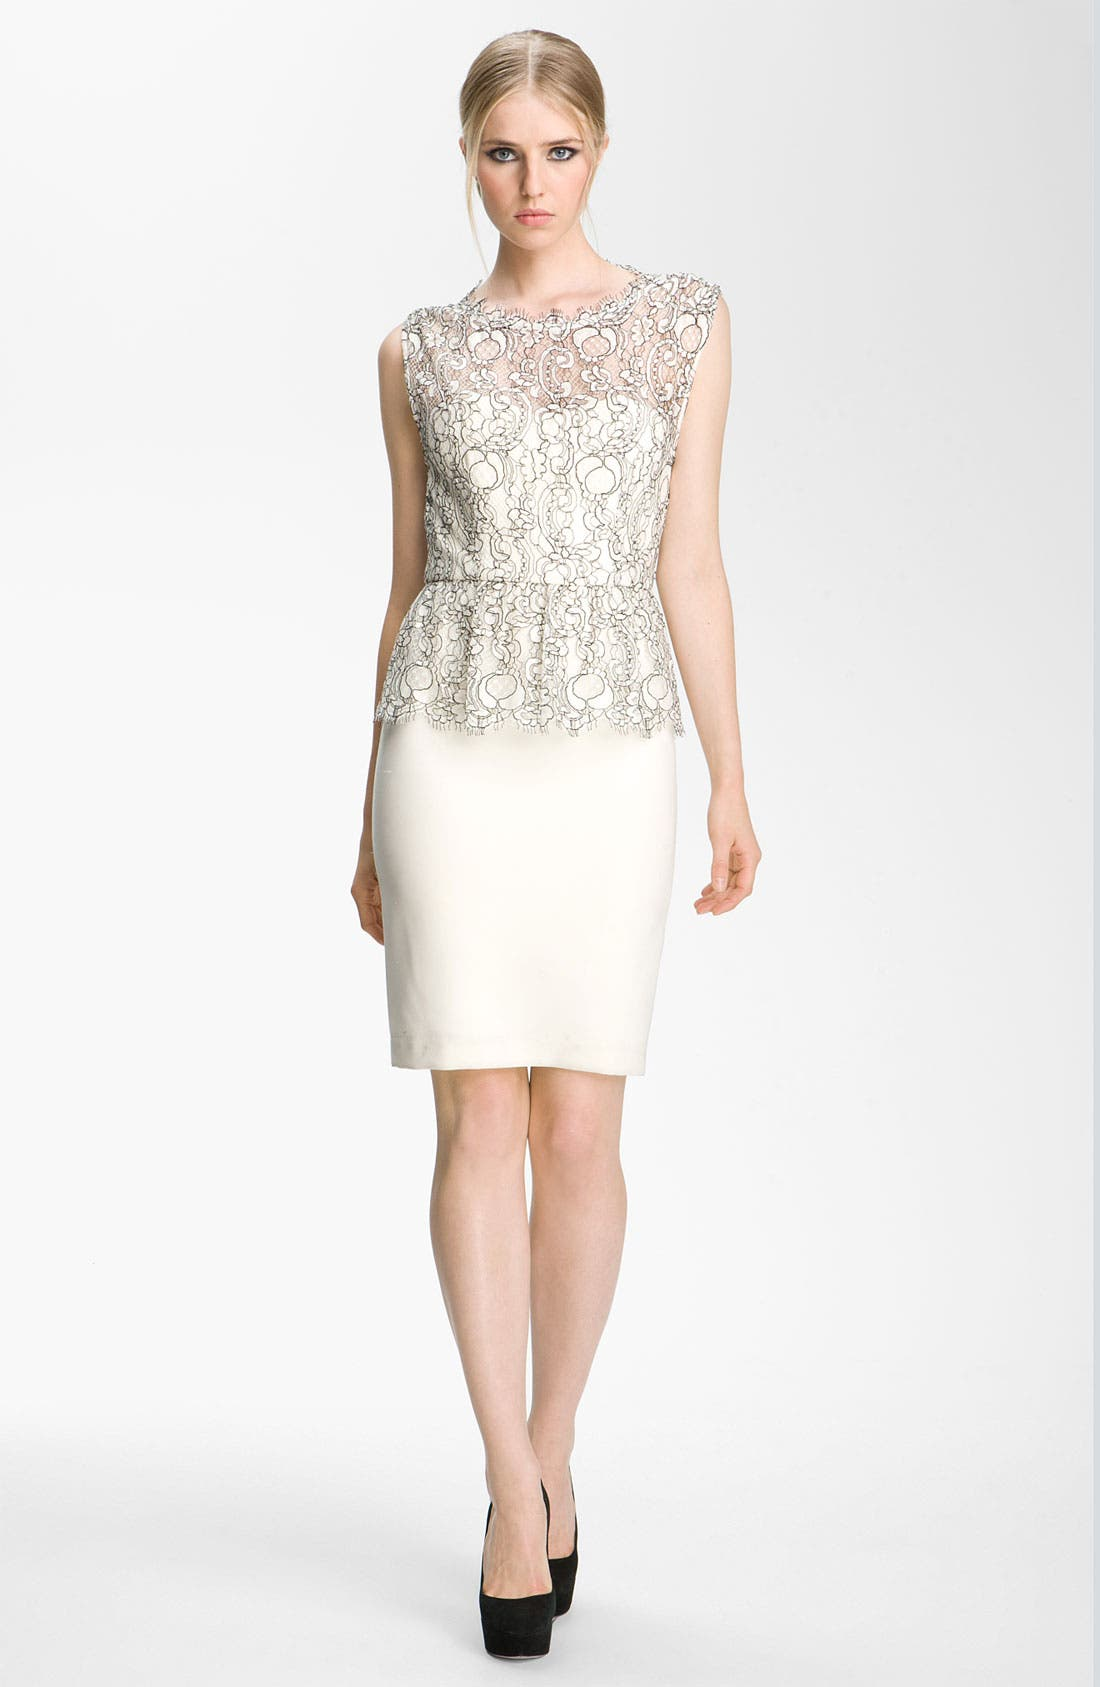 Alternate Image 1 Selected - Alice + Olivia 'Shovan' Lace Overlay Peplum Dress